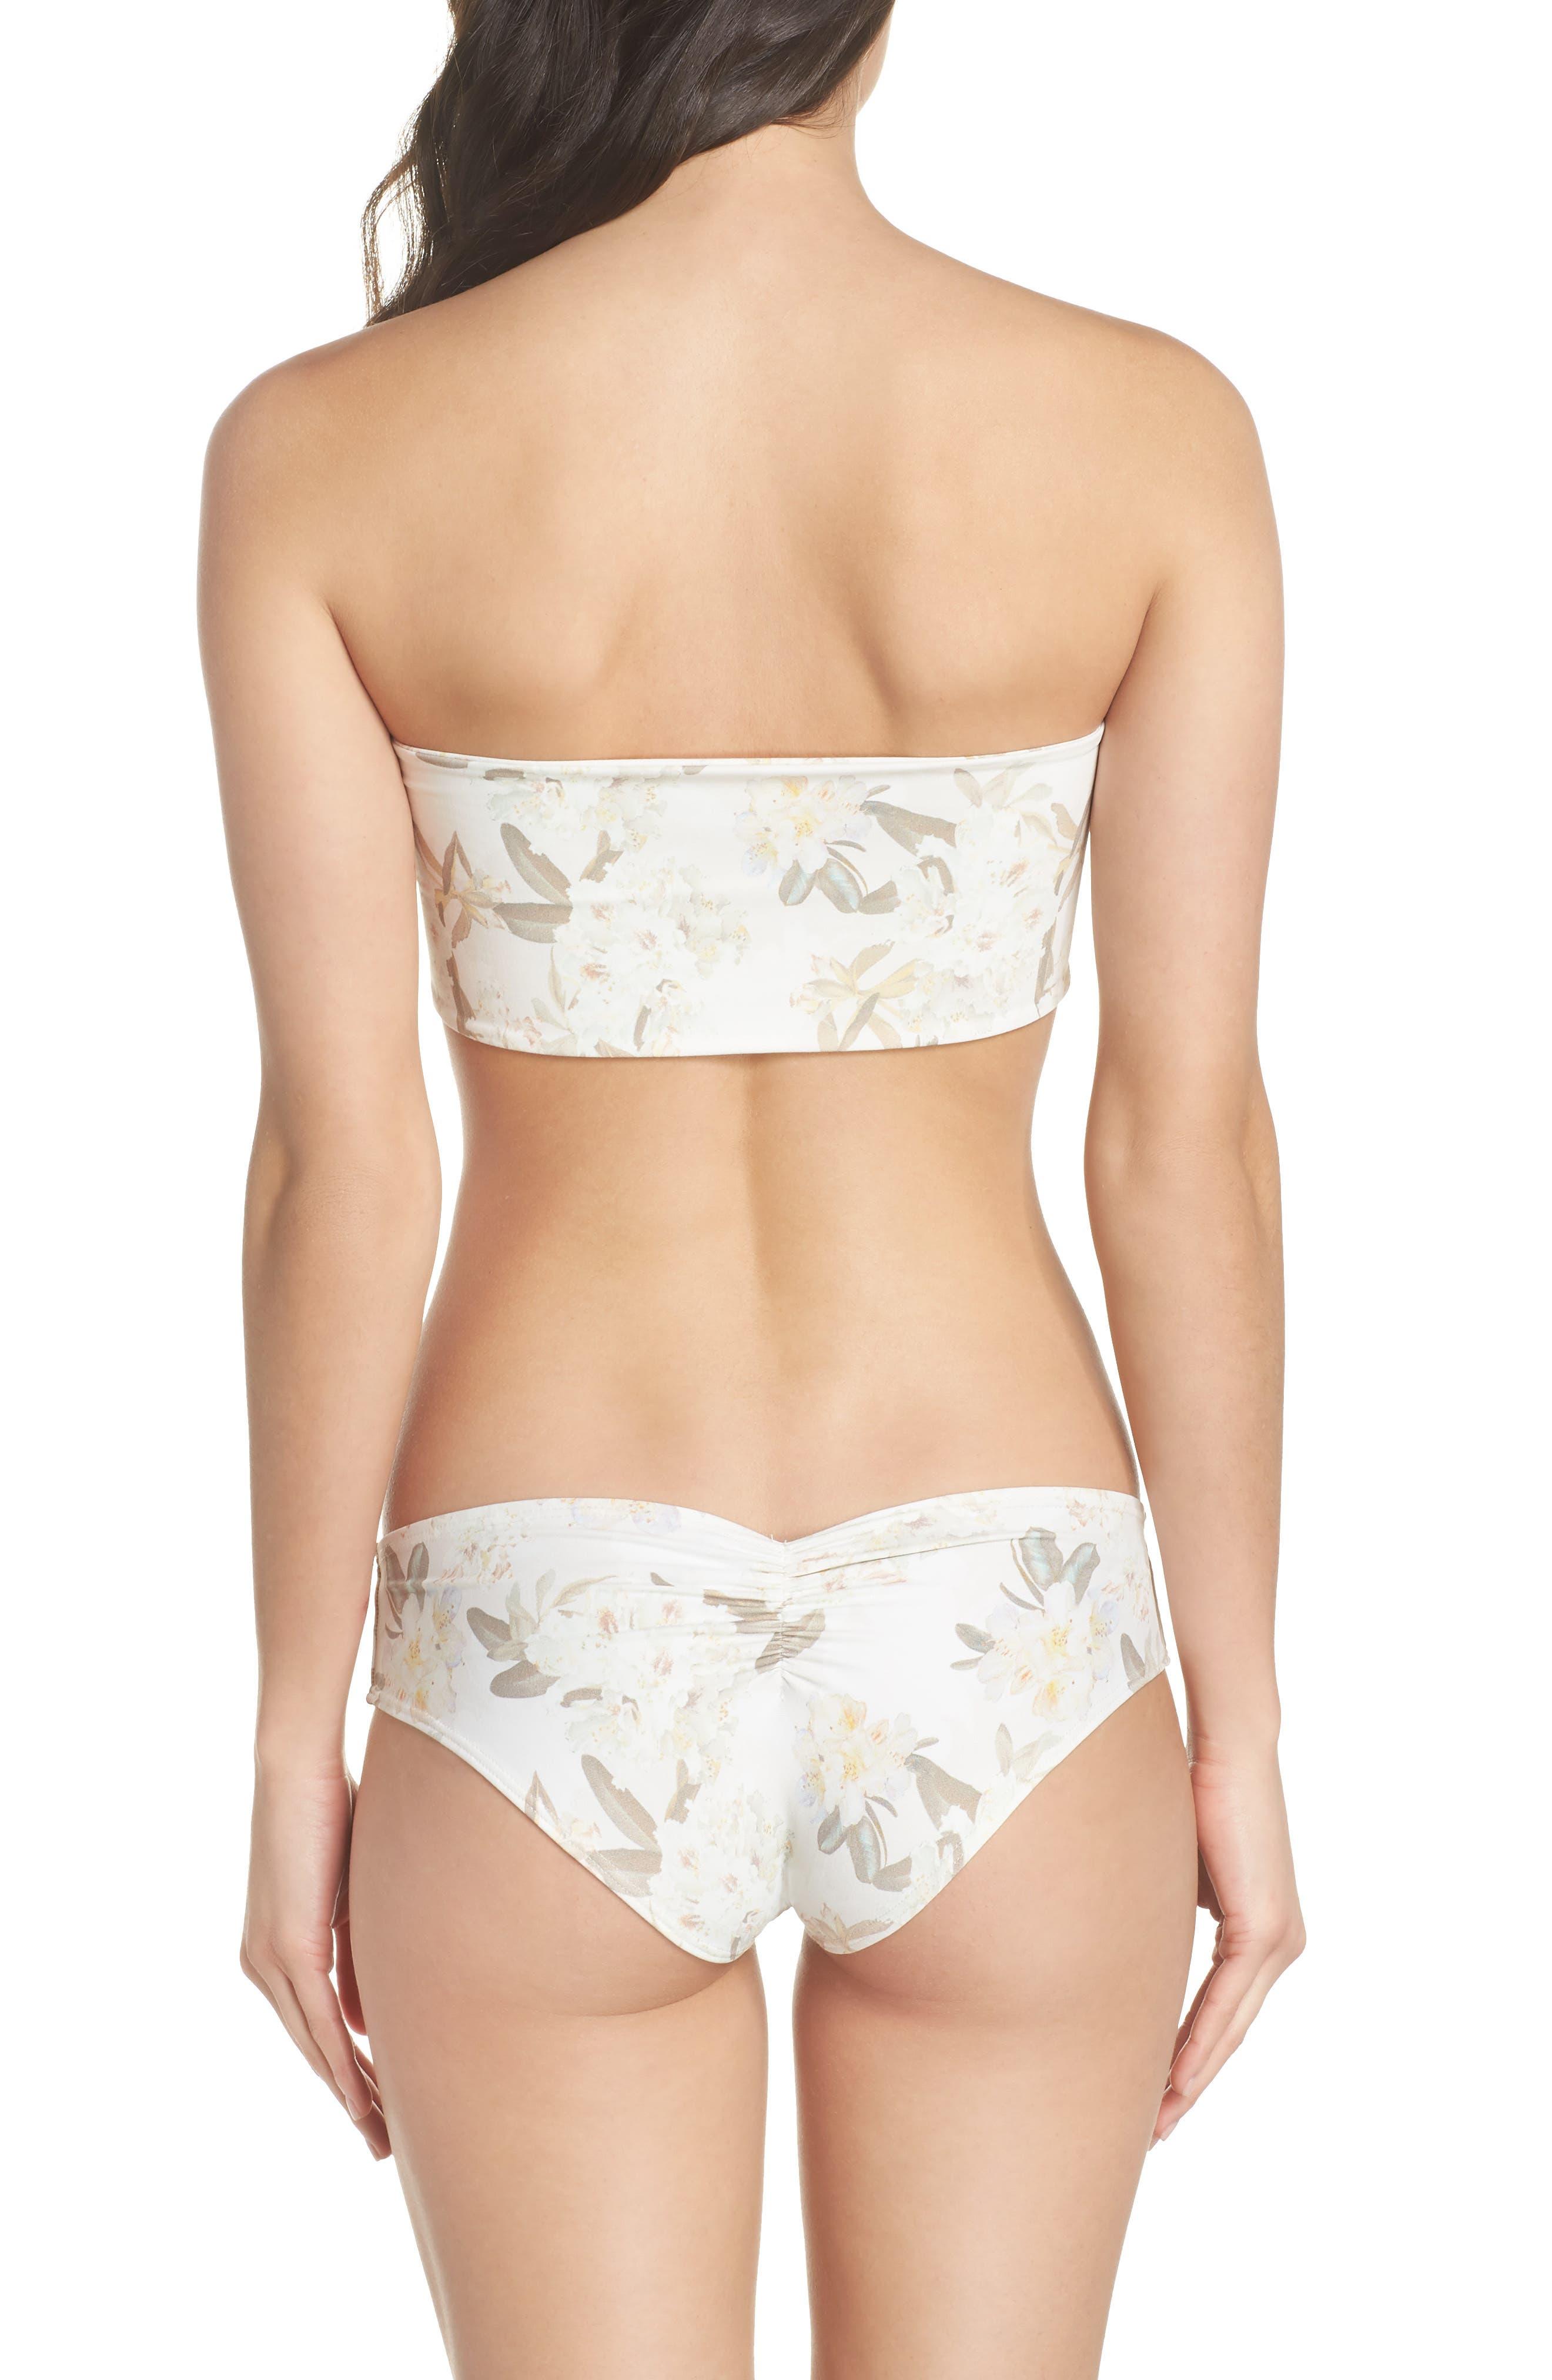 AC Nu Micro Bikini Bottoms,                             Alternate thumbnail 6, color,                             Ete Floral White